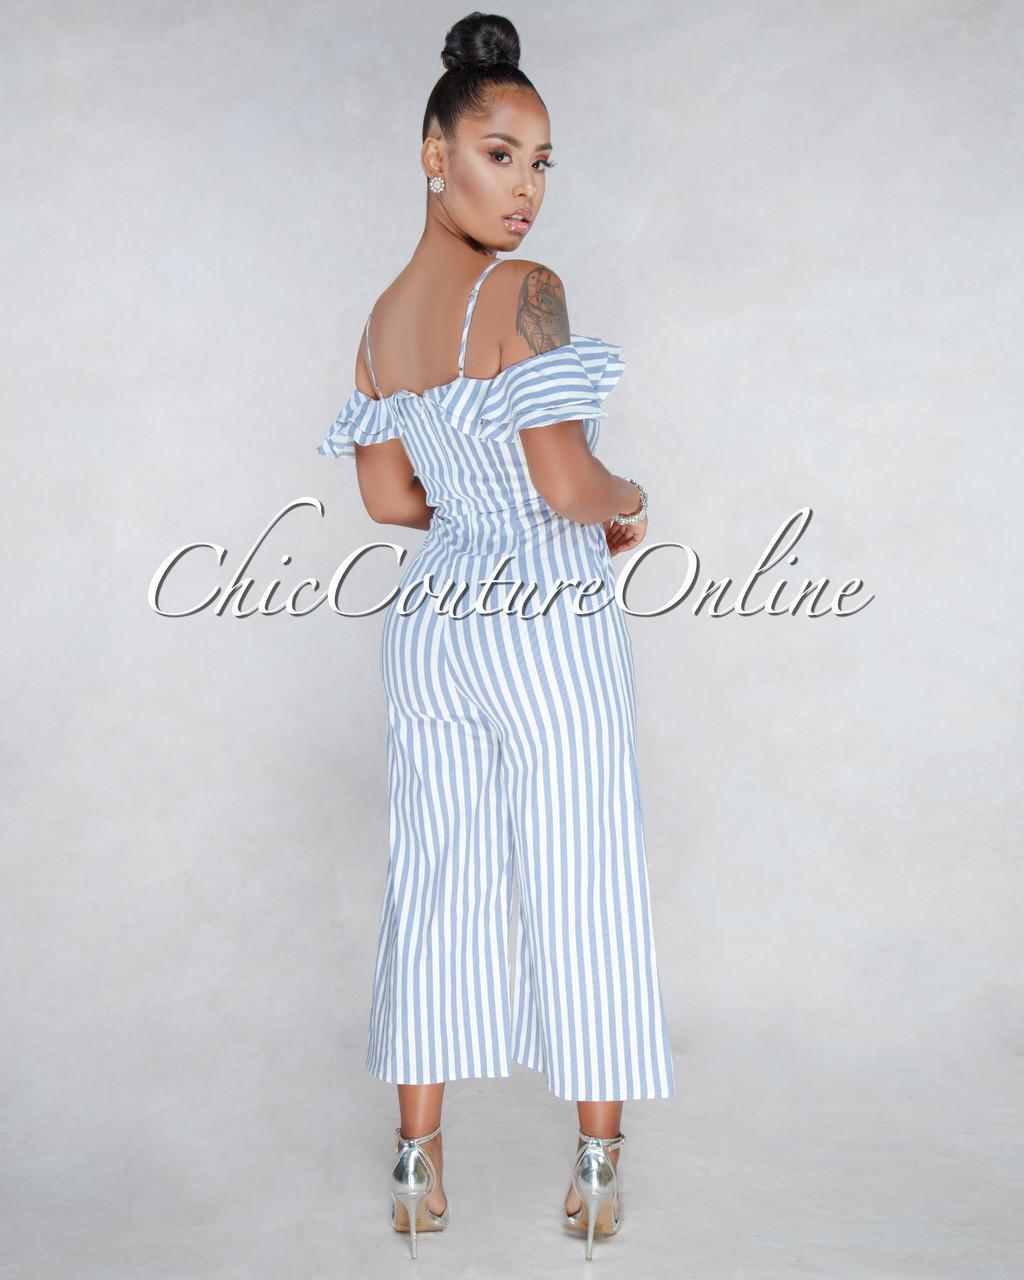 debd76dff70 Rhett Blue White Stripes Print Jumpsuit. Price   50.00. Image 1. Larger    More Photos